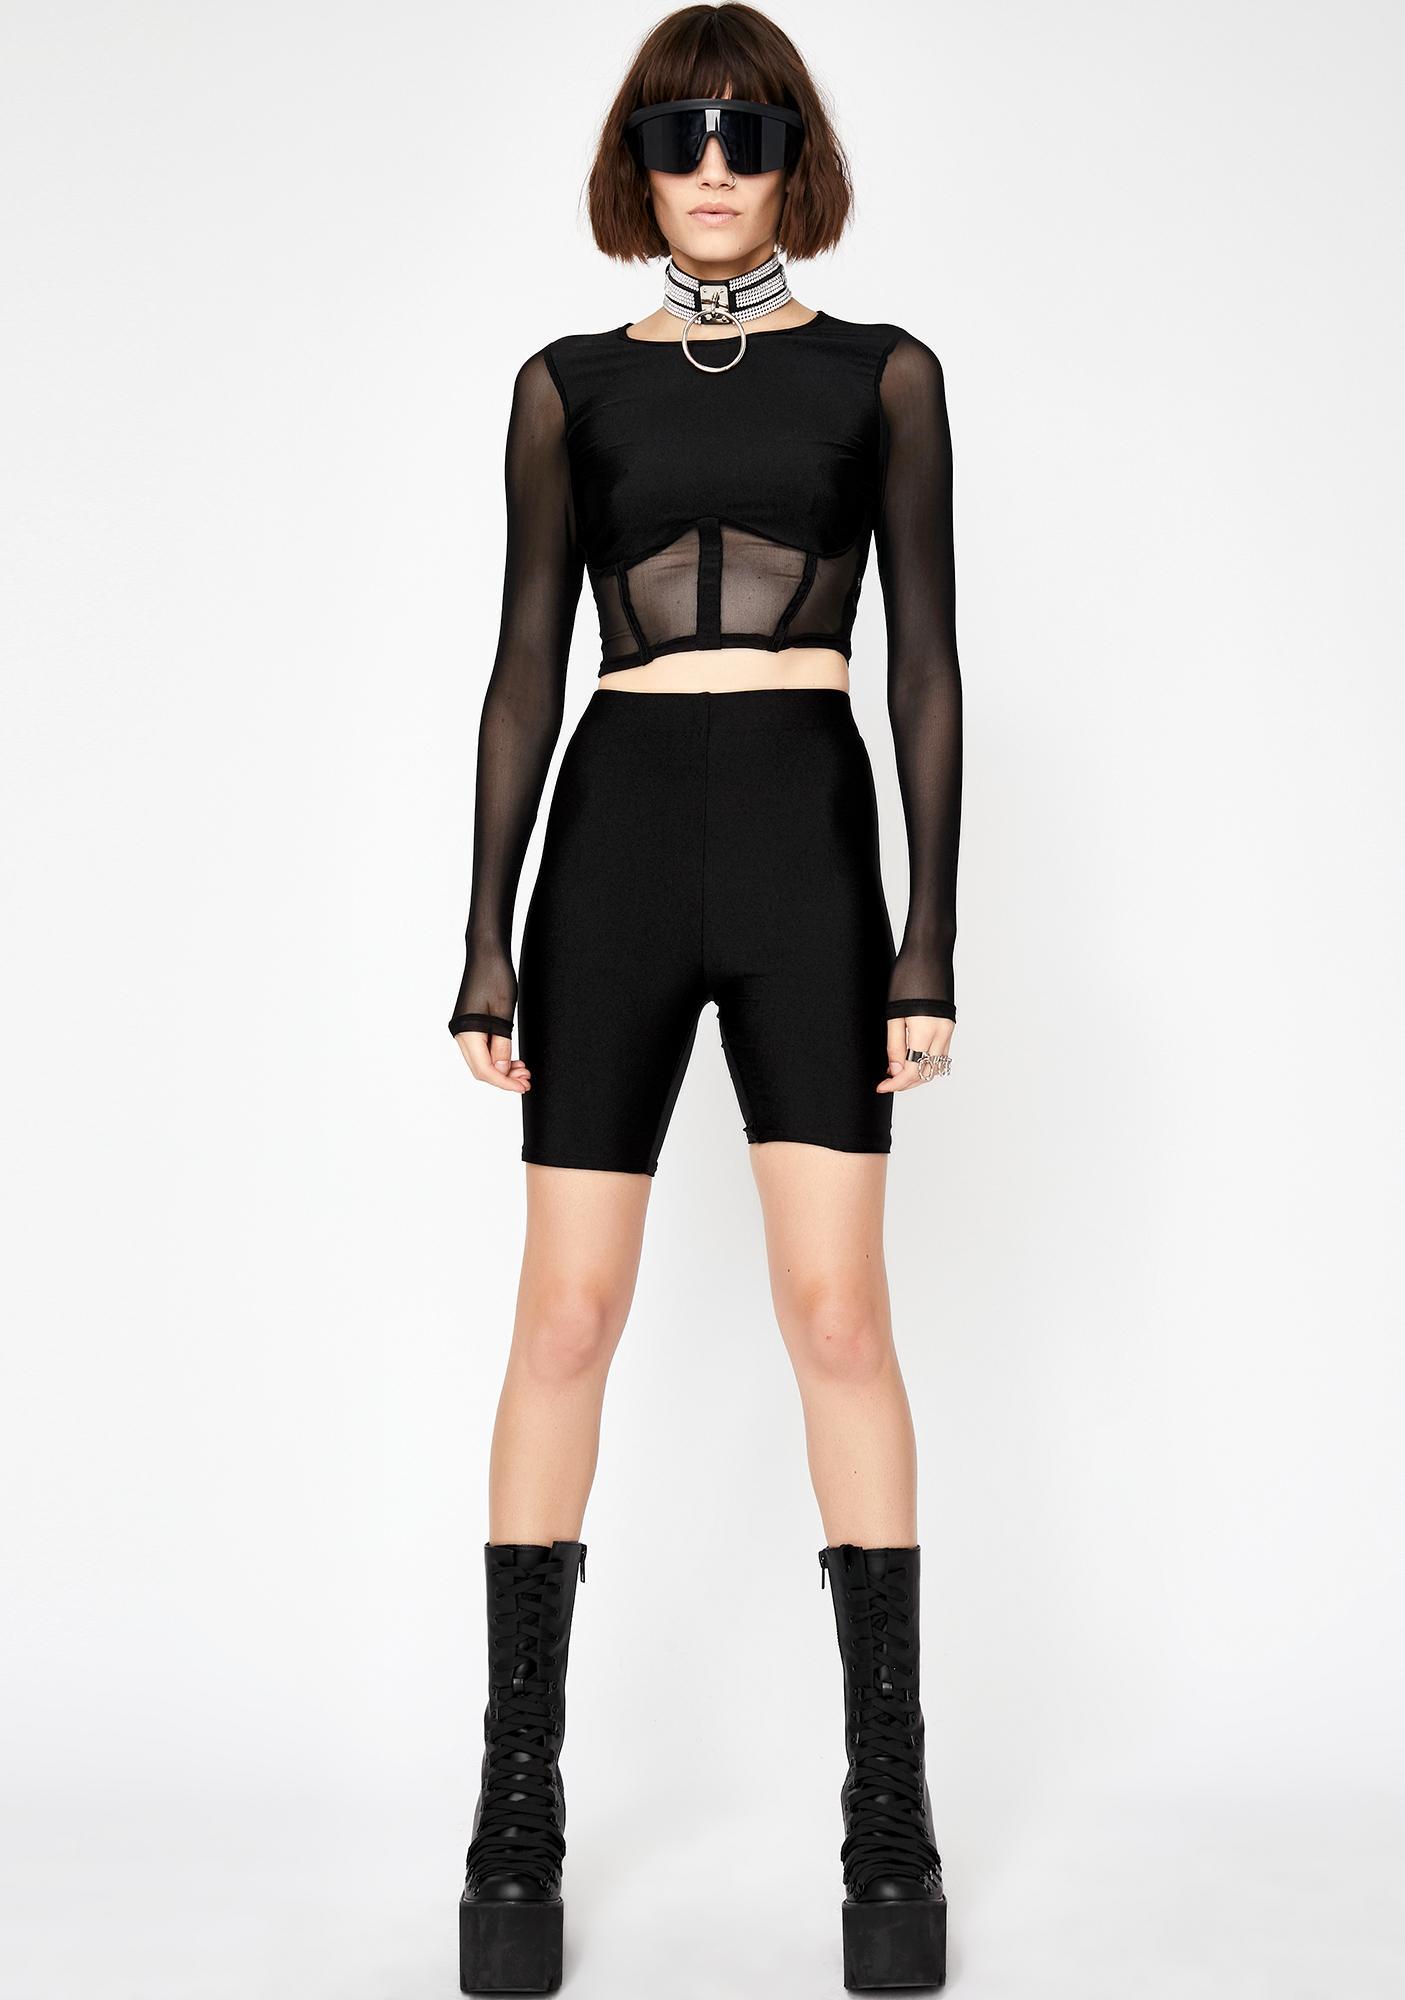 Baddies Only Shorts Set